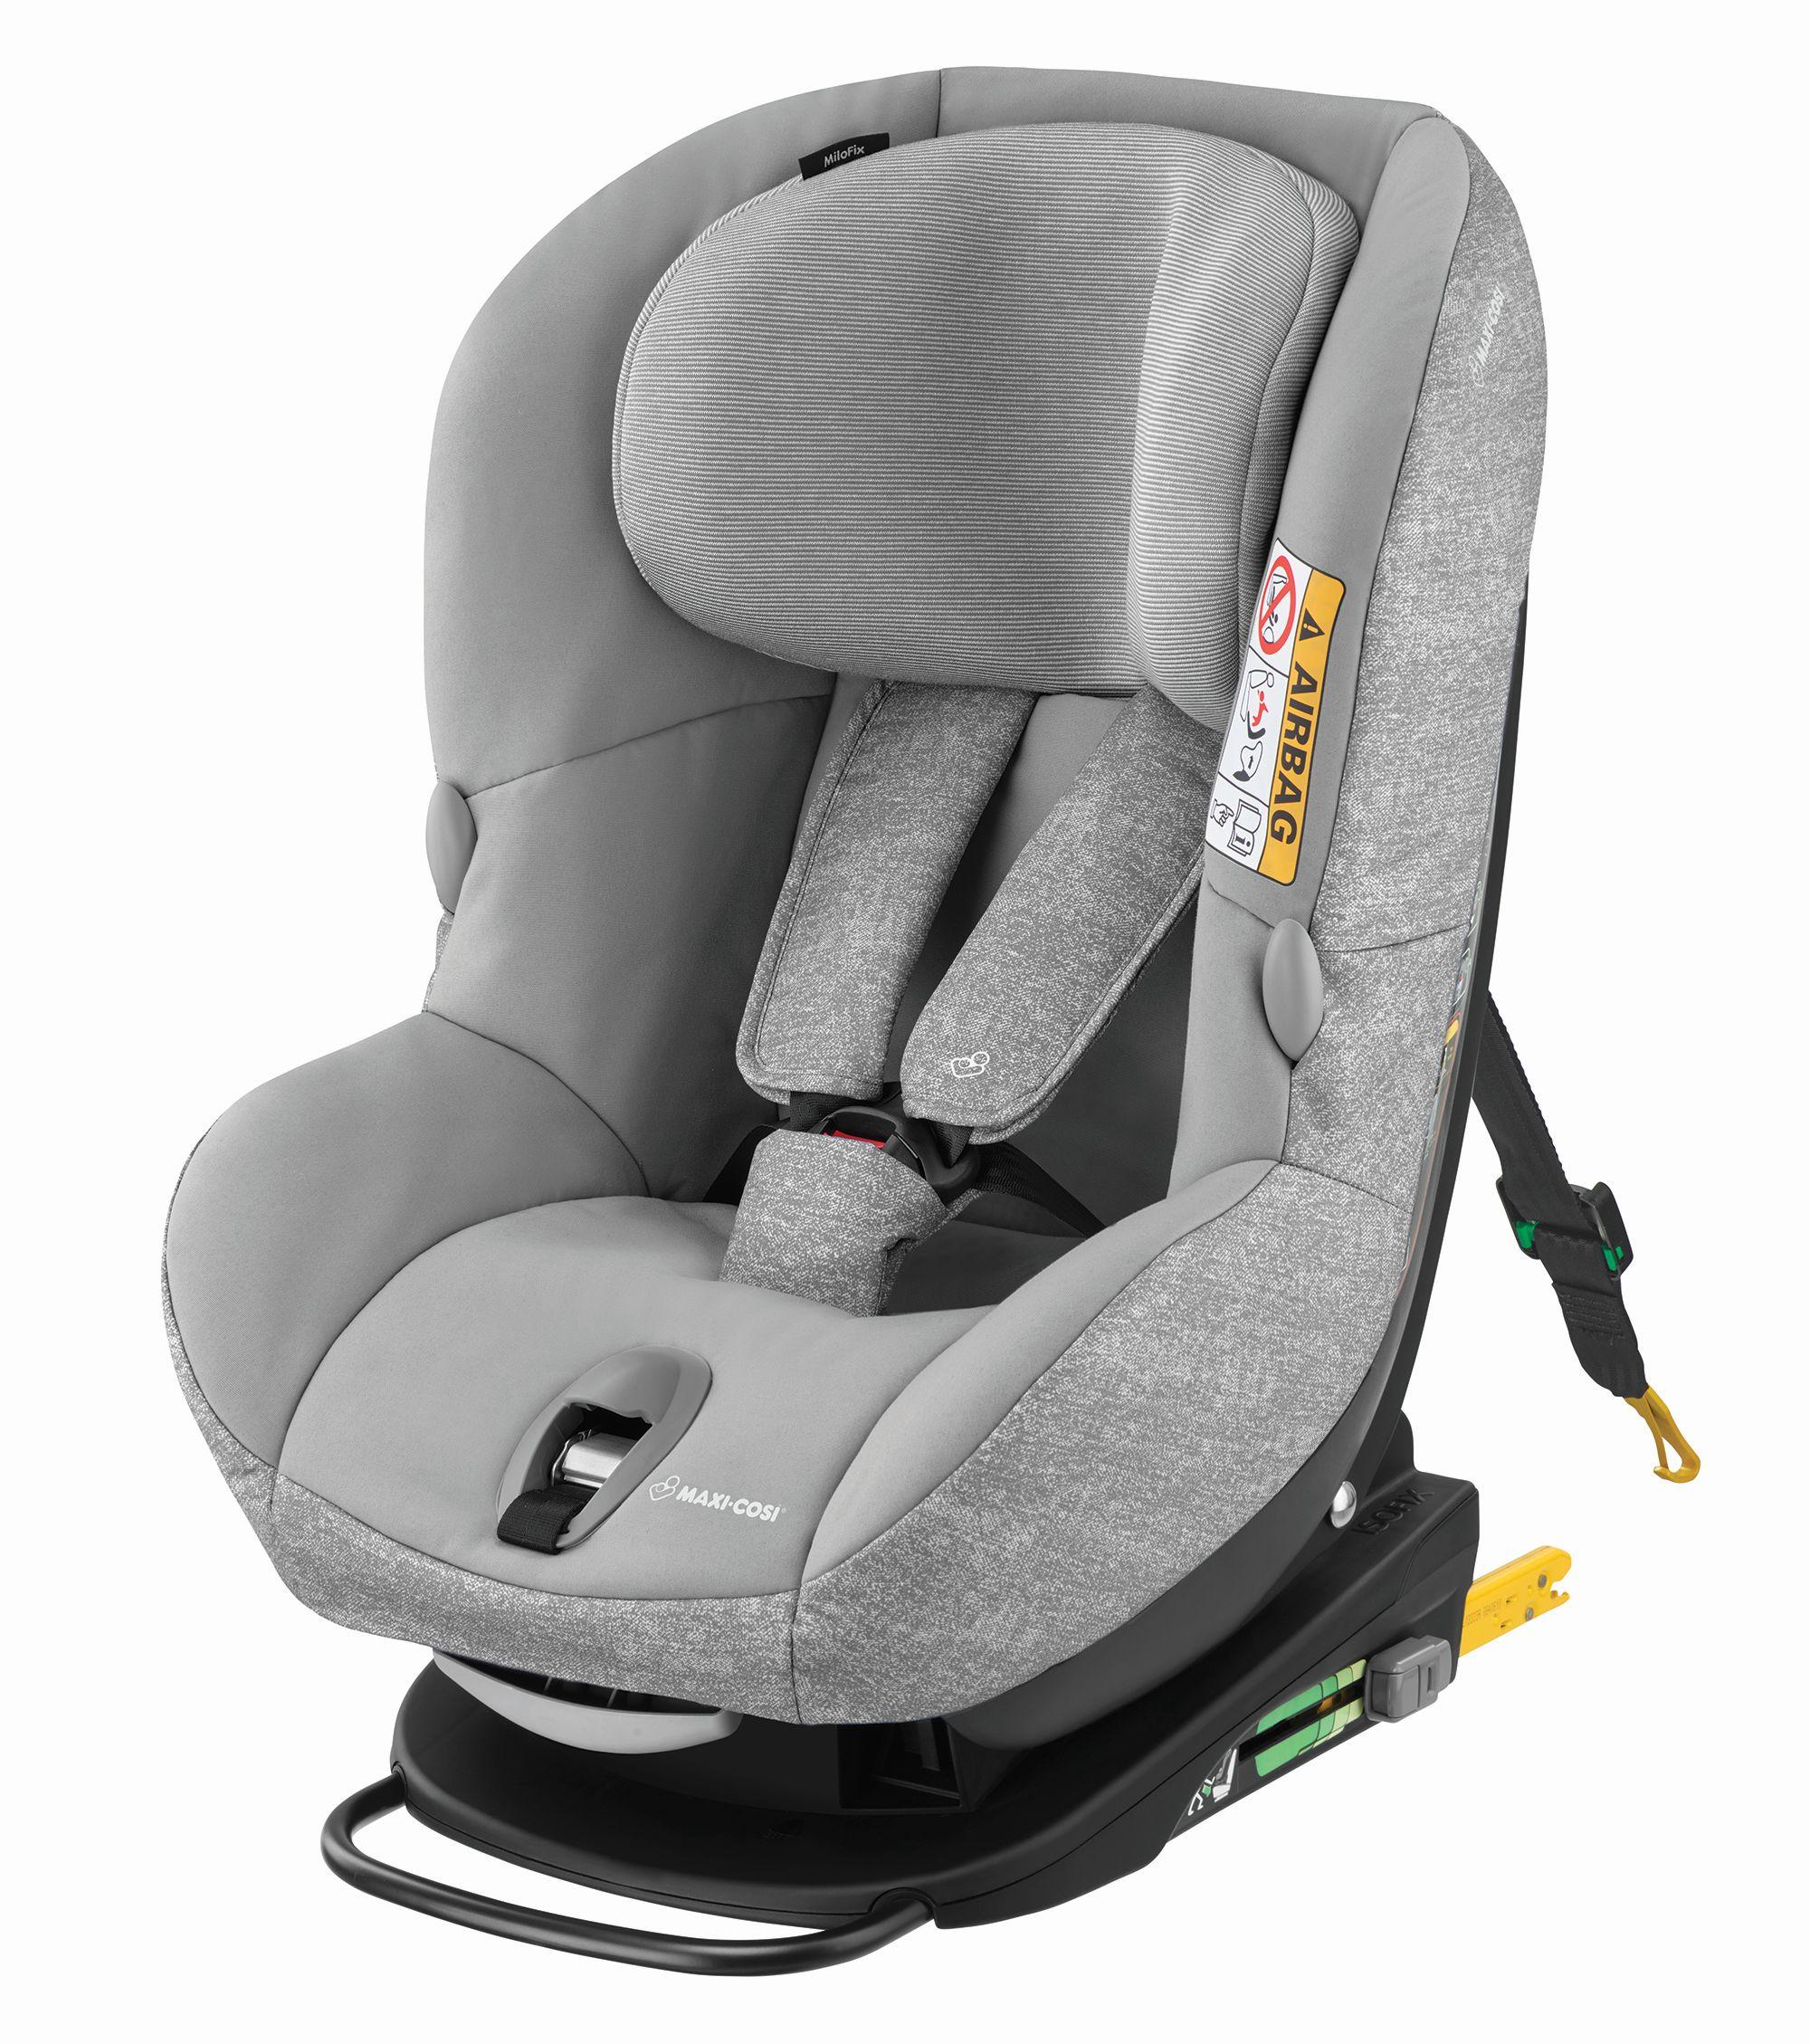 silla de coche maxi cosi milofix 2018 nomad grey comprar en kidsroom sillas de coche. Black Bedroom Furniture Sets. Home Design Ideas